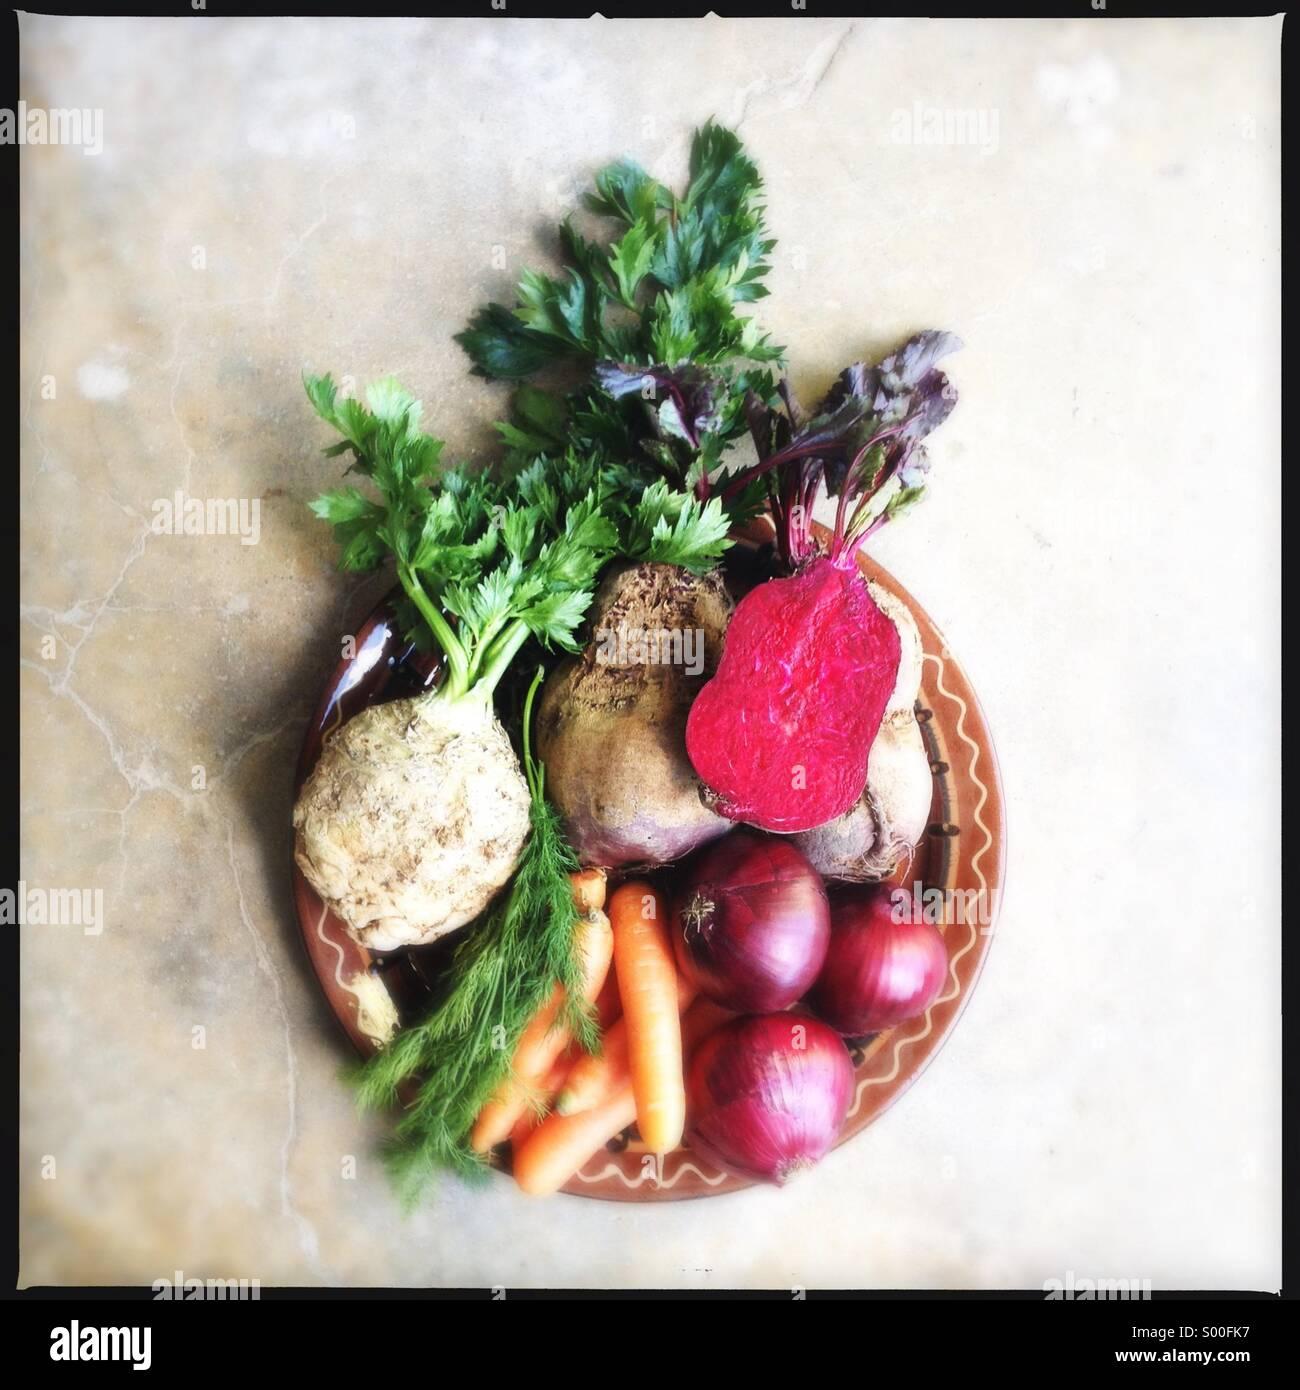 Ingredients for Borscht, Eastern European beet root soup. Stock Photo